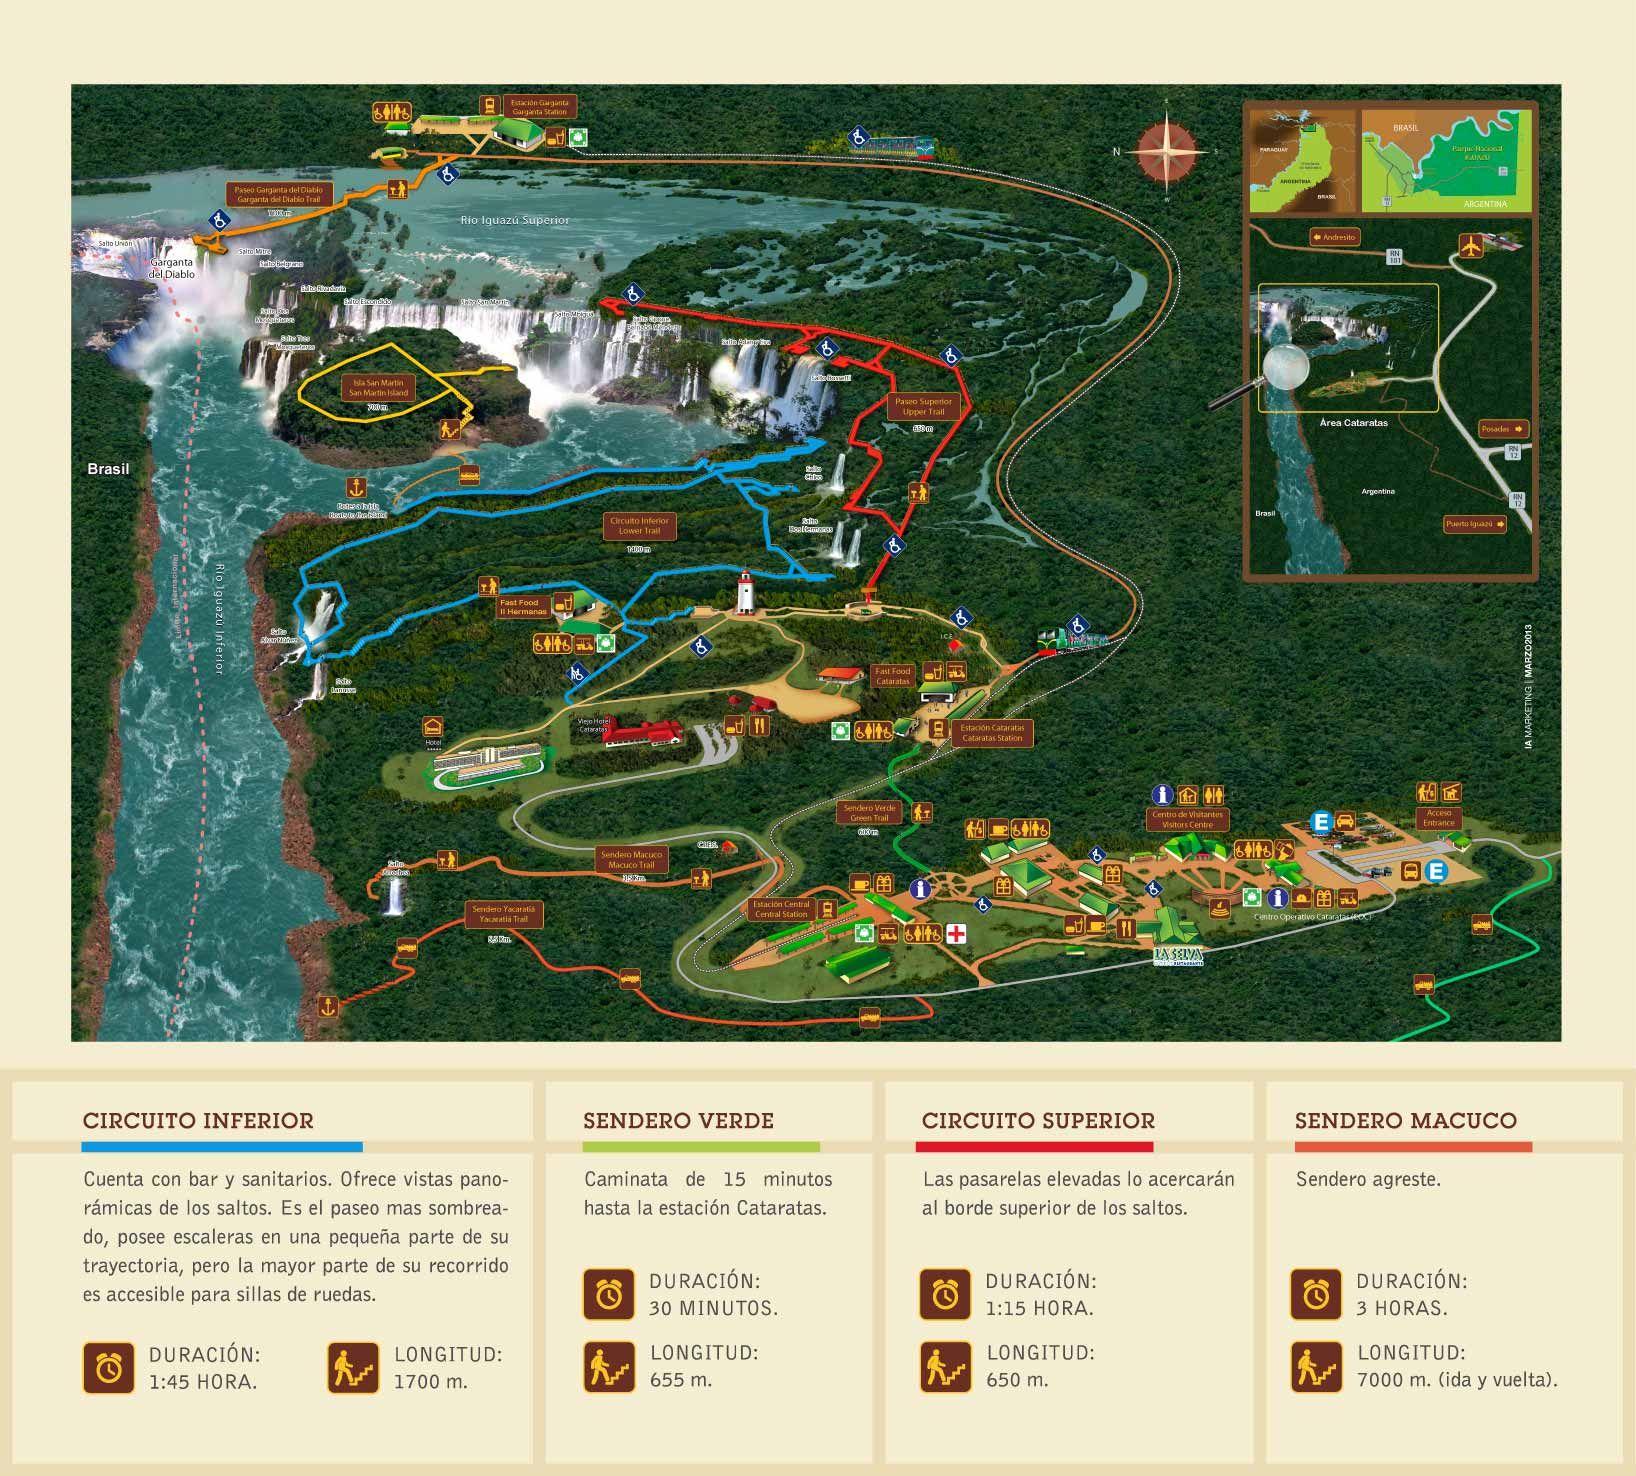 Cataratas De Iguazu Lado Argentino Mapa.Pin De Cataratas Del Iguazu En Sendero Macuco Cataratas